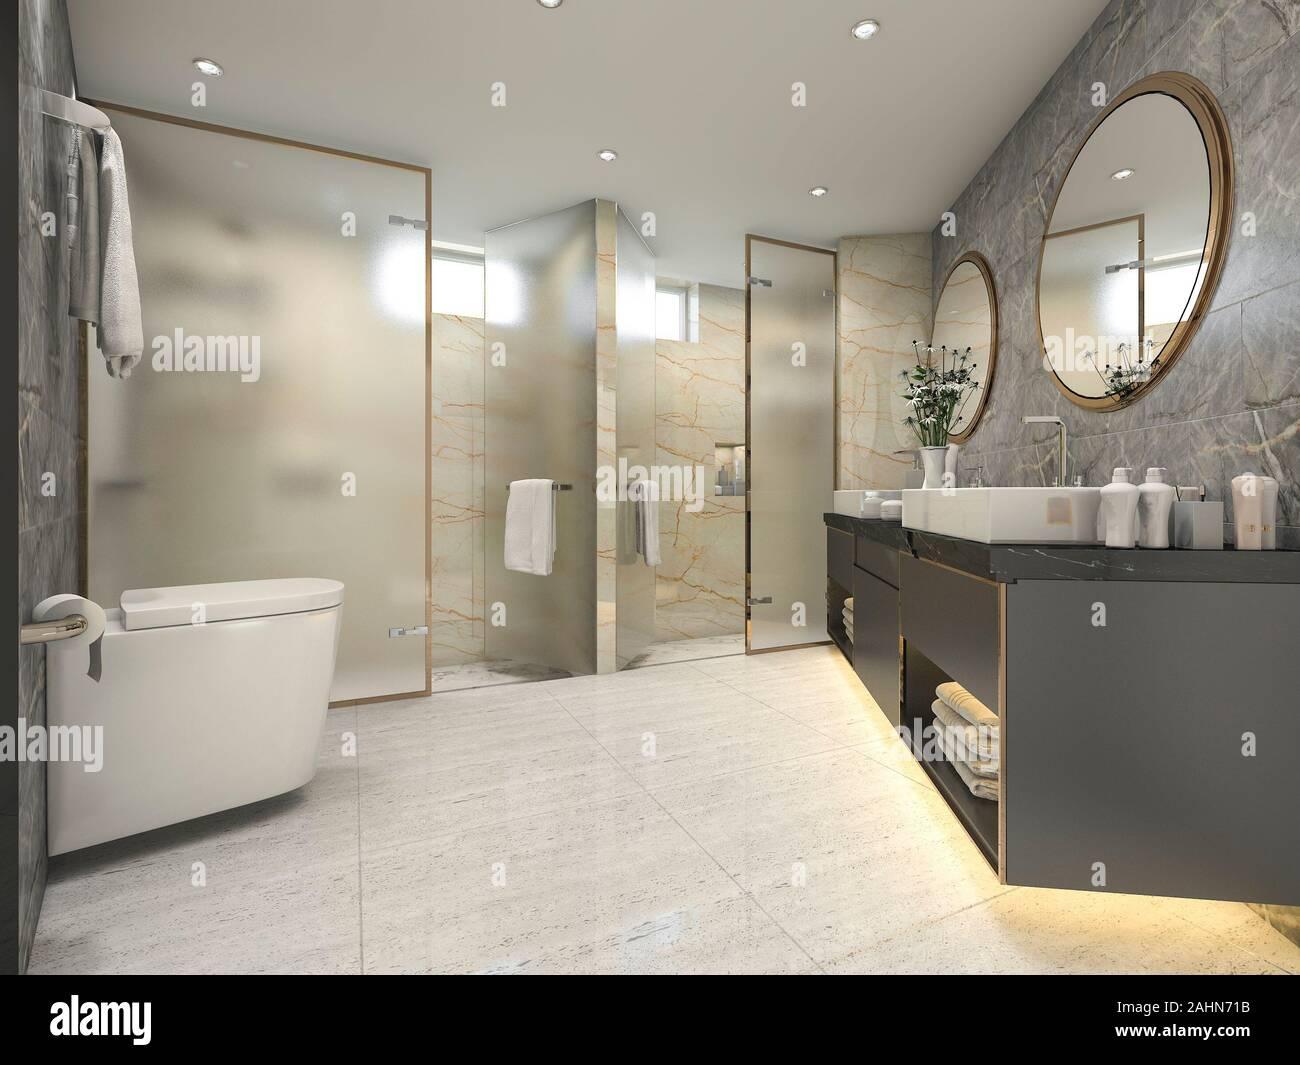 3d Rendering Cream Modern Vintage Bathroom With Luxury Tile Decor Stock Photo Alamy